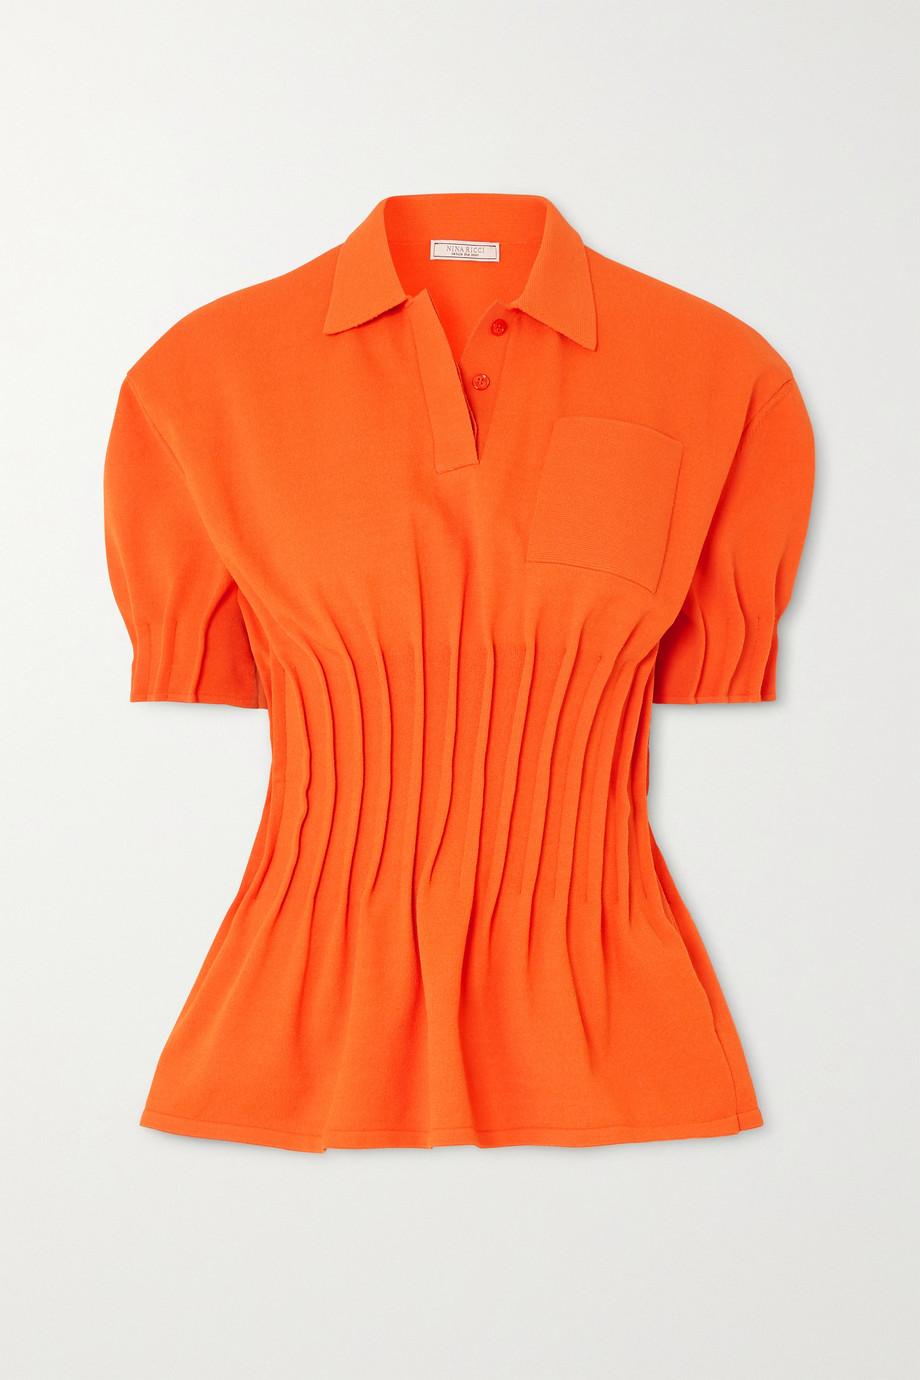 Nina Ricci Pintucked terry polo shirt